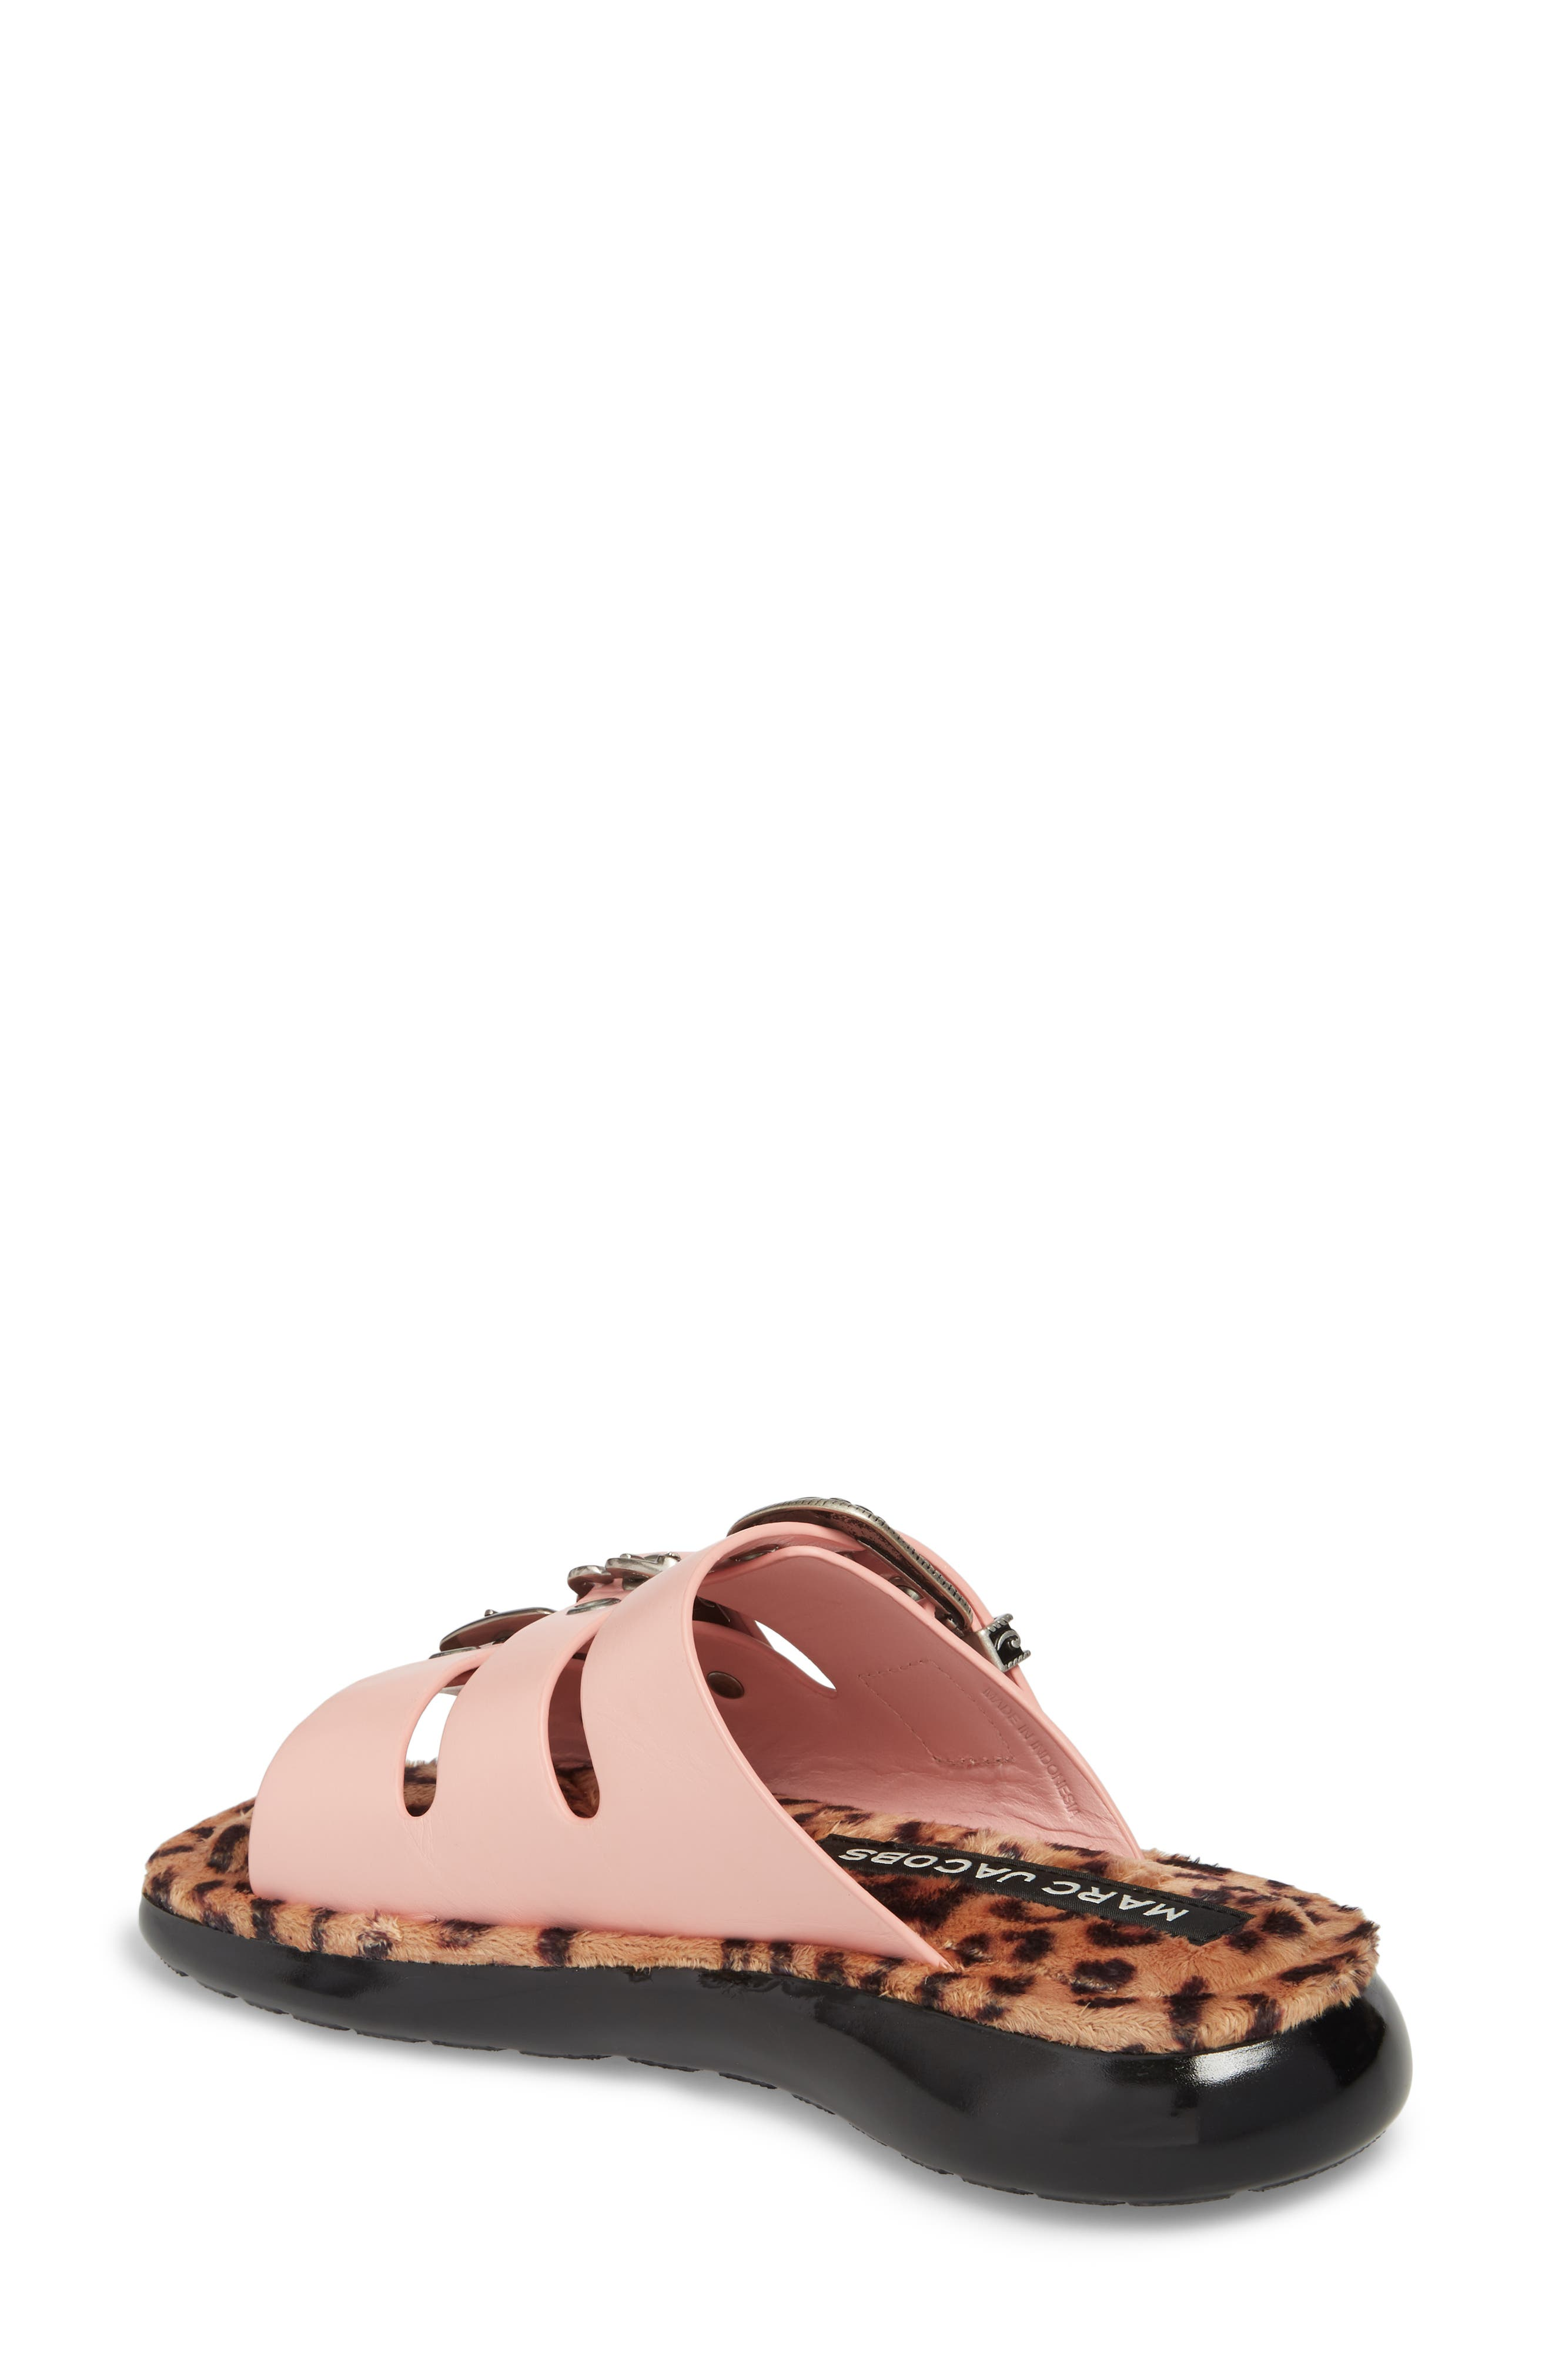 Emerson Faux Fur Sport Sandal,                             Alternate thumbnail 2, color,                             LIGHT PINK MULTI